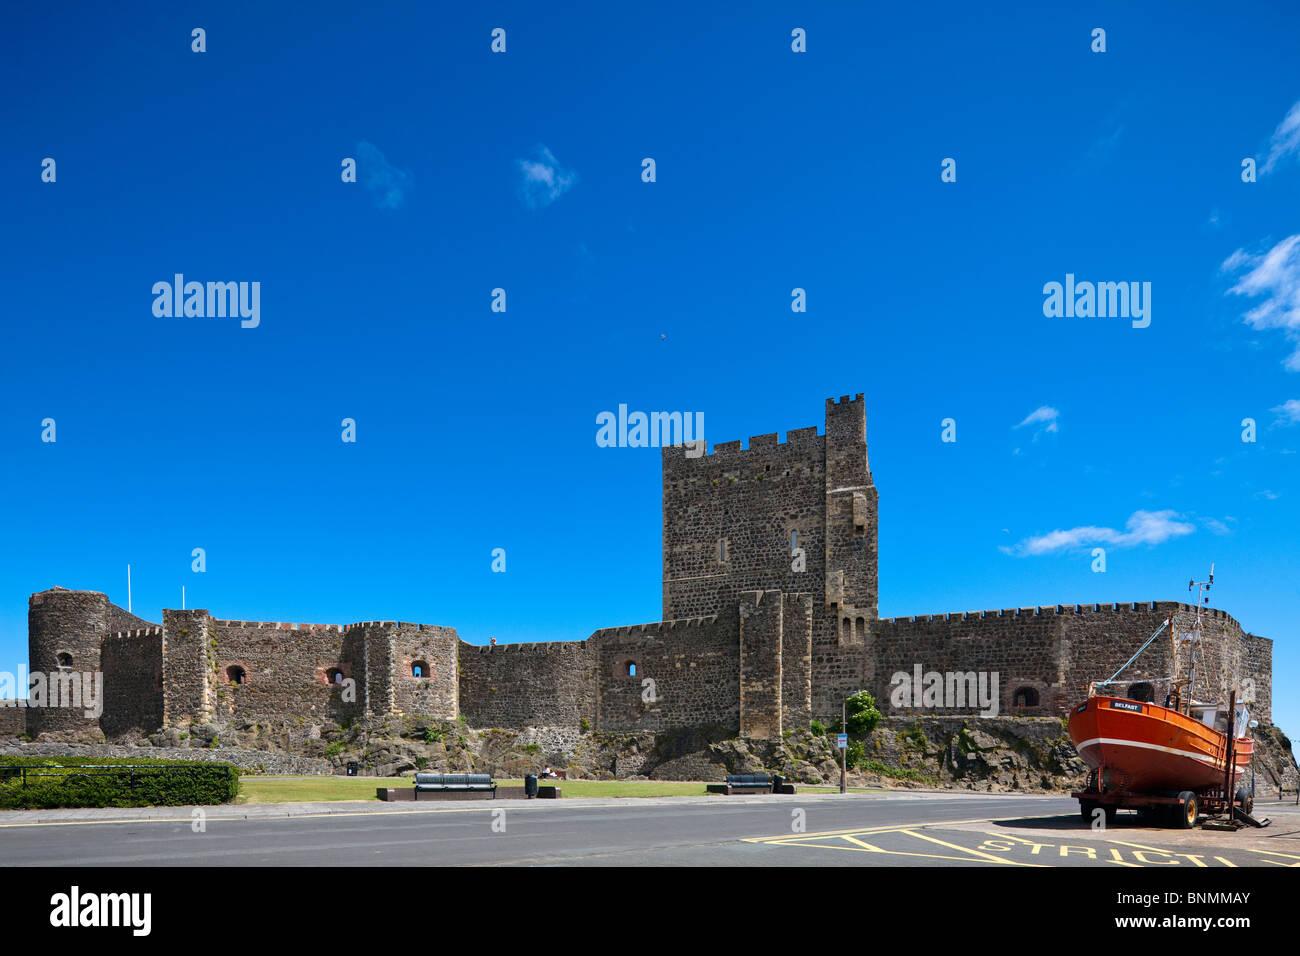 Carrickfergus castle, Northern Ireland, UK - Stock Image